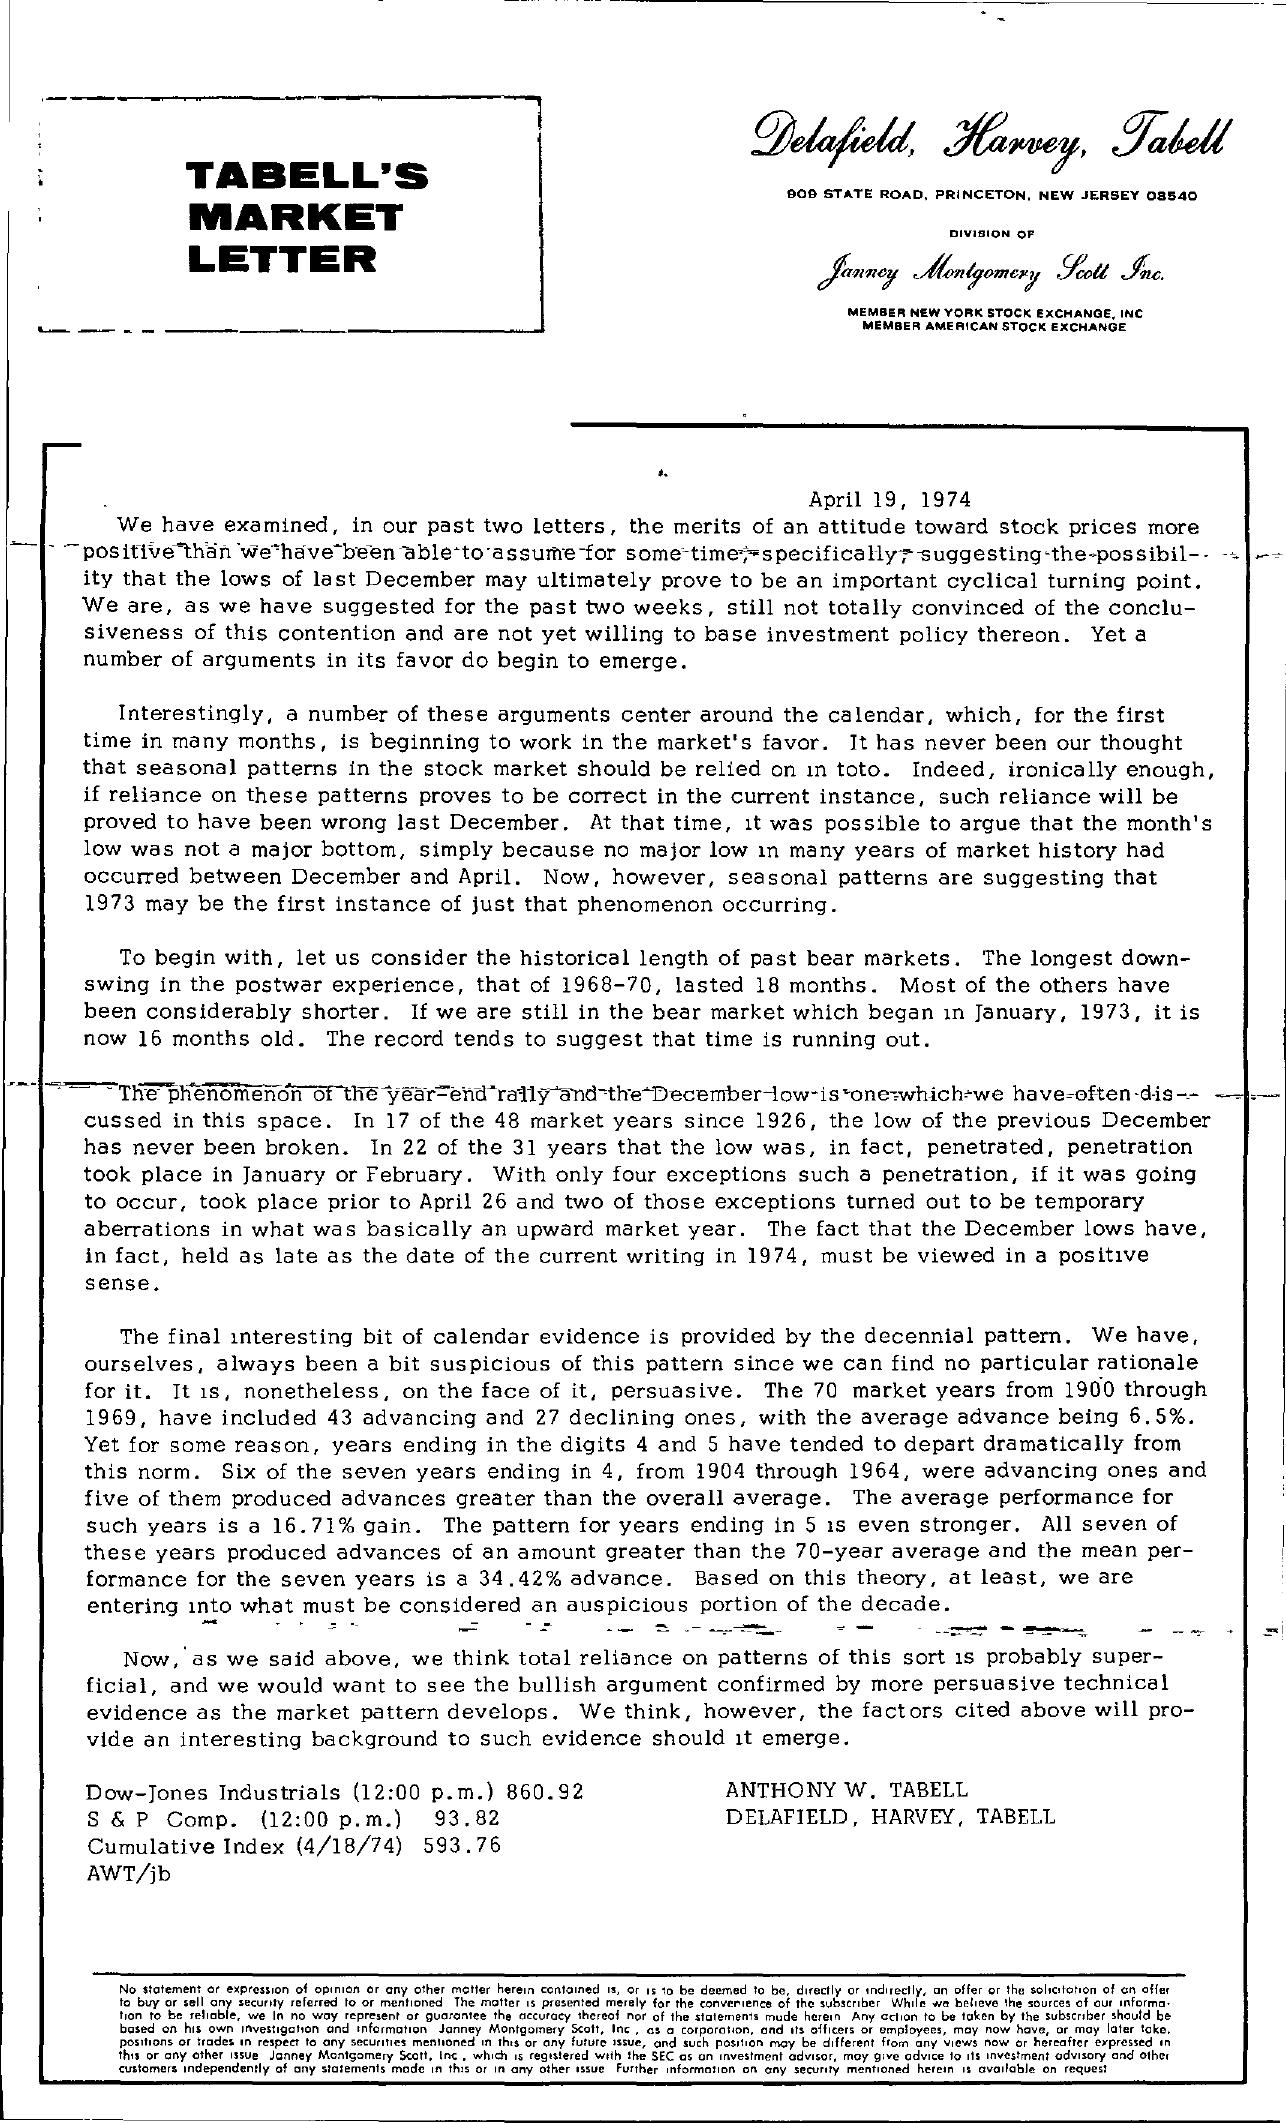 Tabell's Market Letter - April 19, 1974